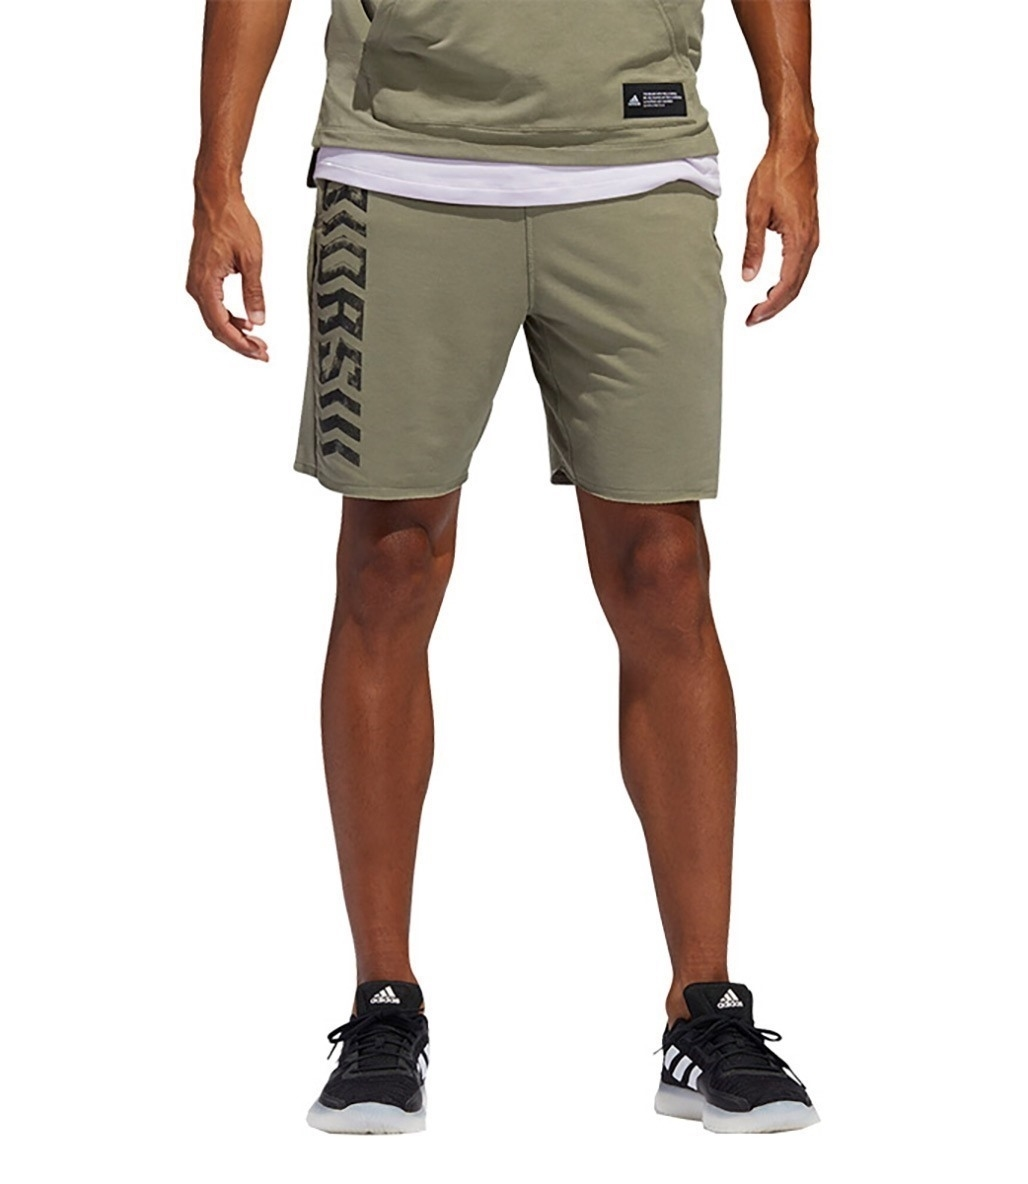 Adidas Tko Short Leggrn Şort Haki